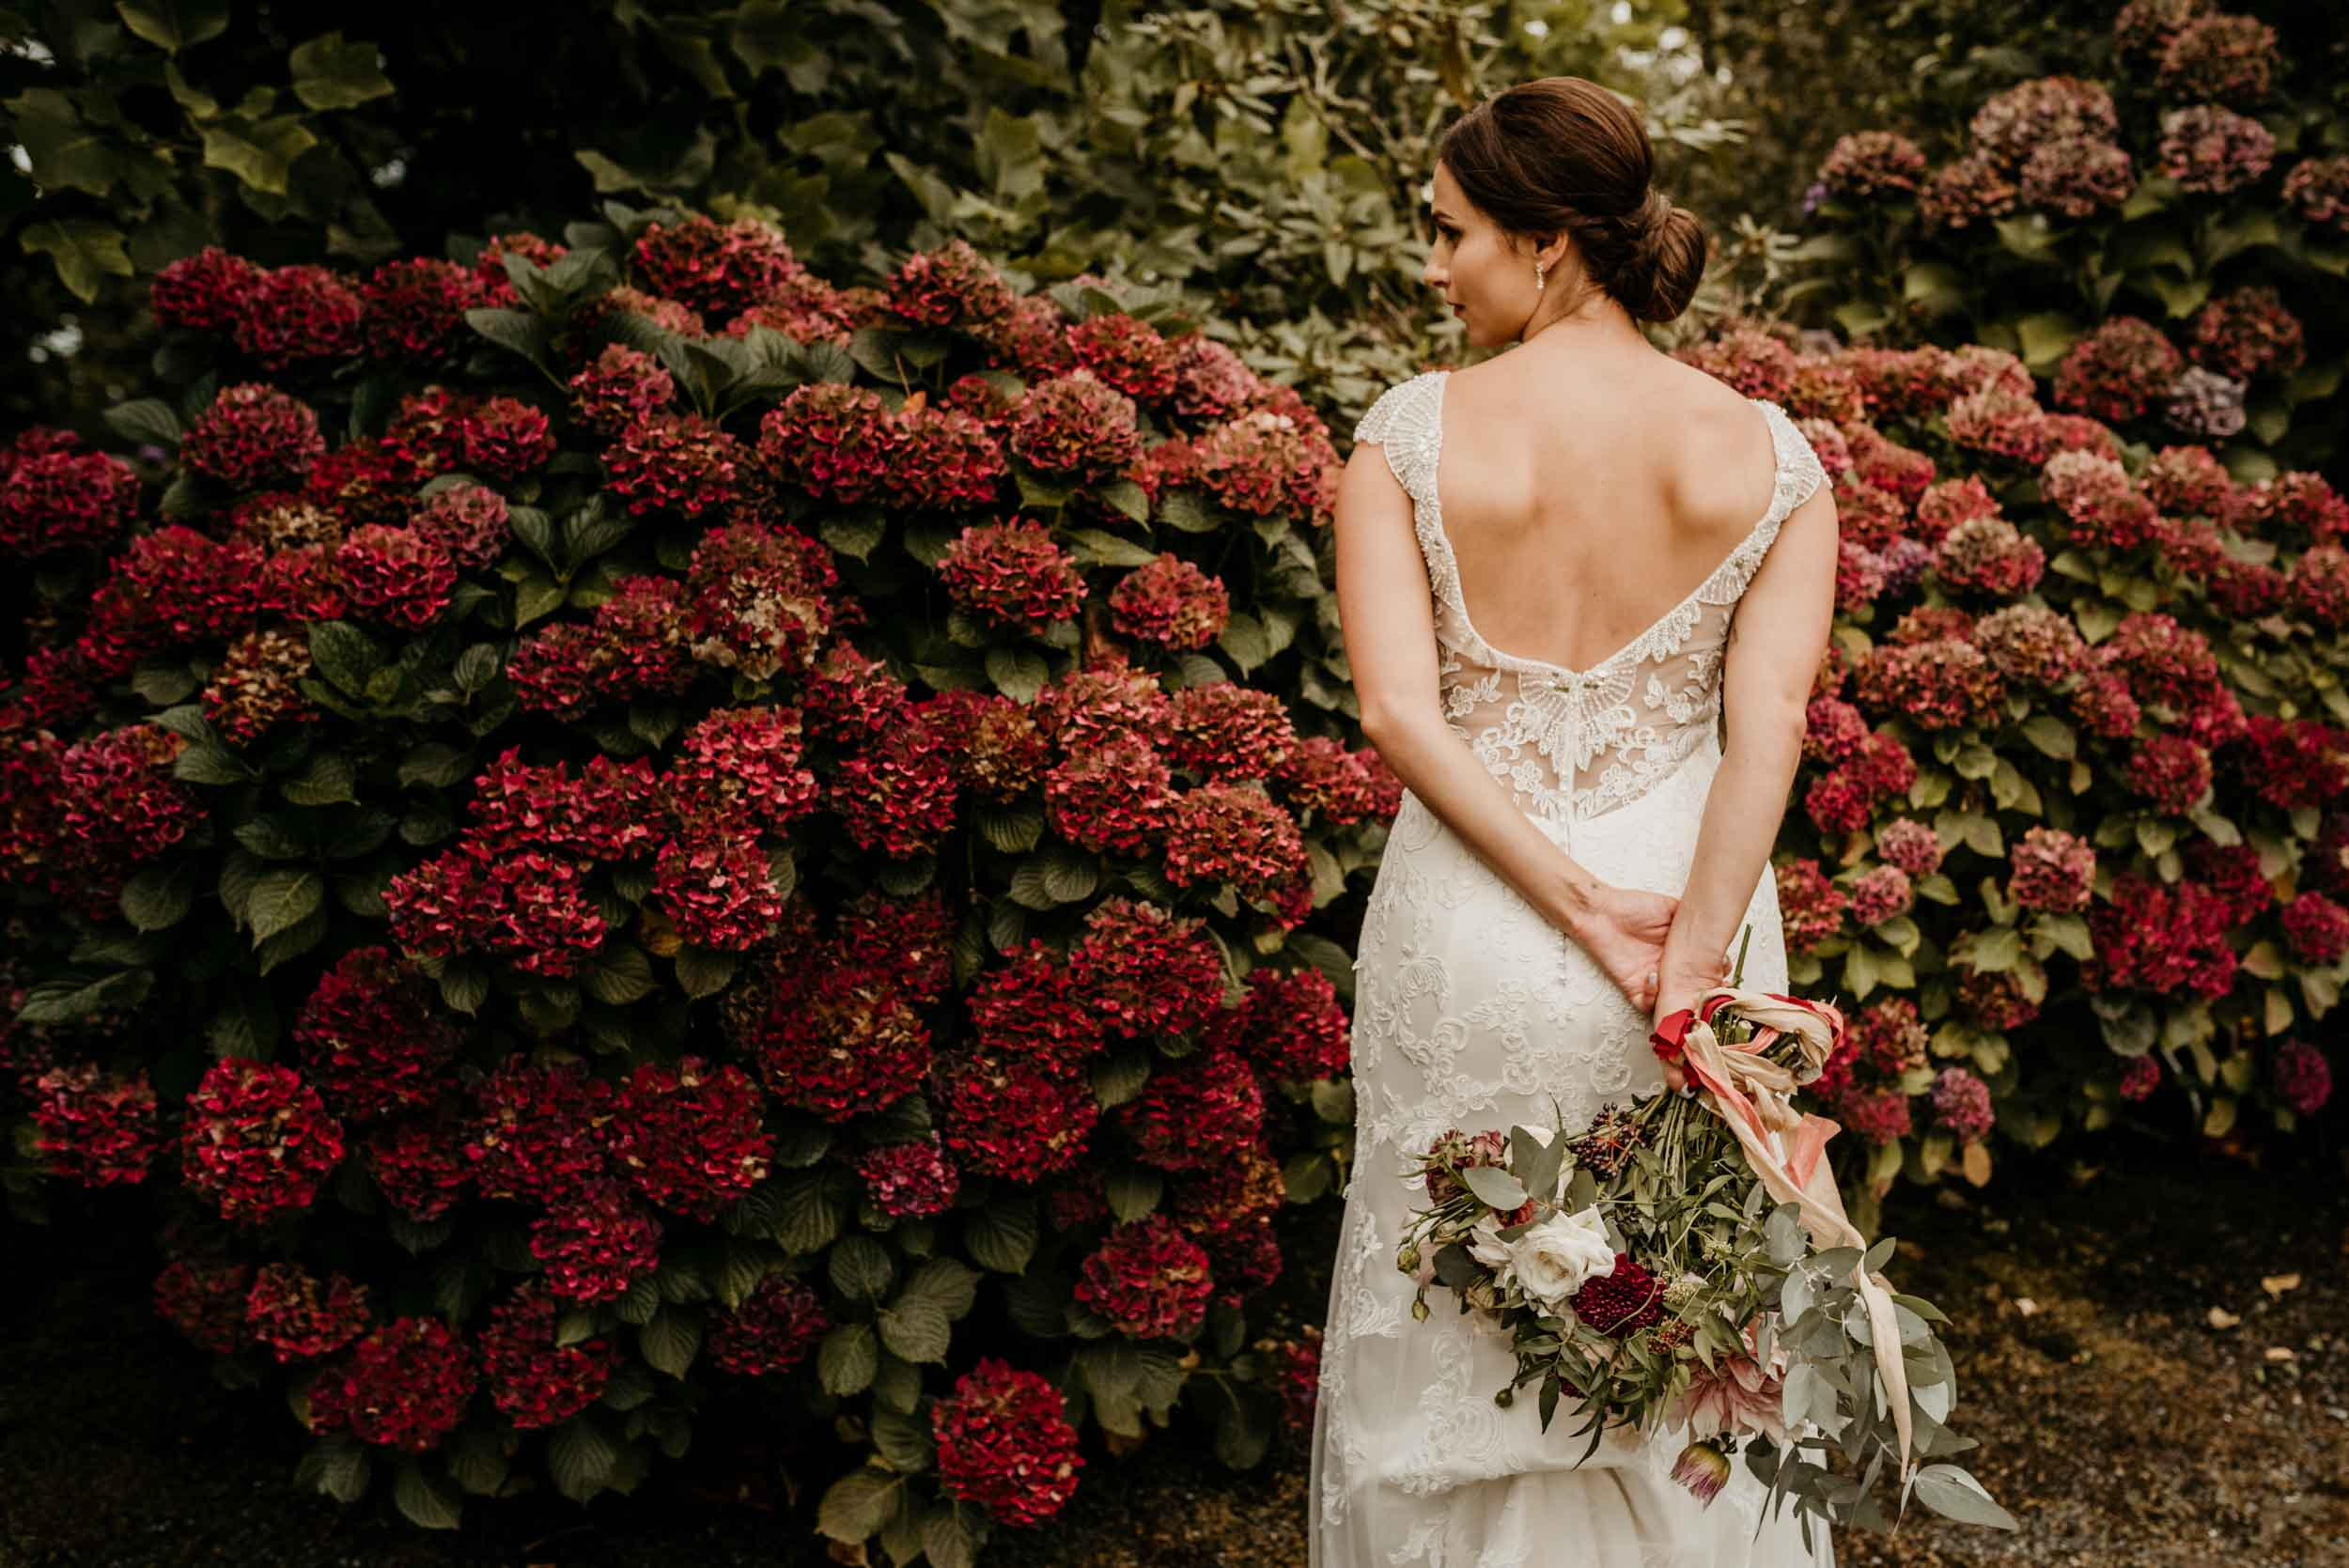 The Raw Photographer - Cairns Wedding Photographer - New Zealand Destination Photography - Travel - Australian-6.jpg